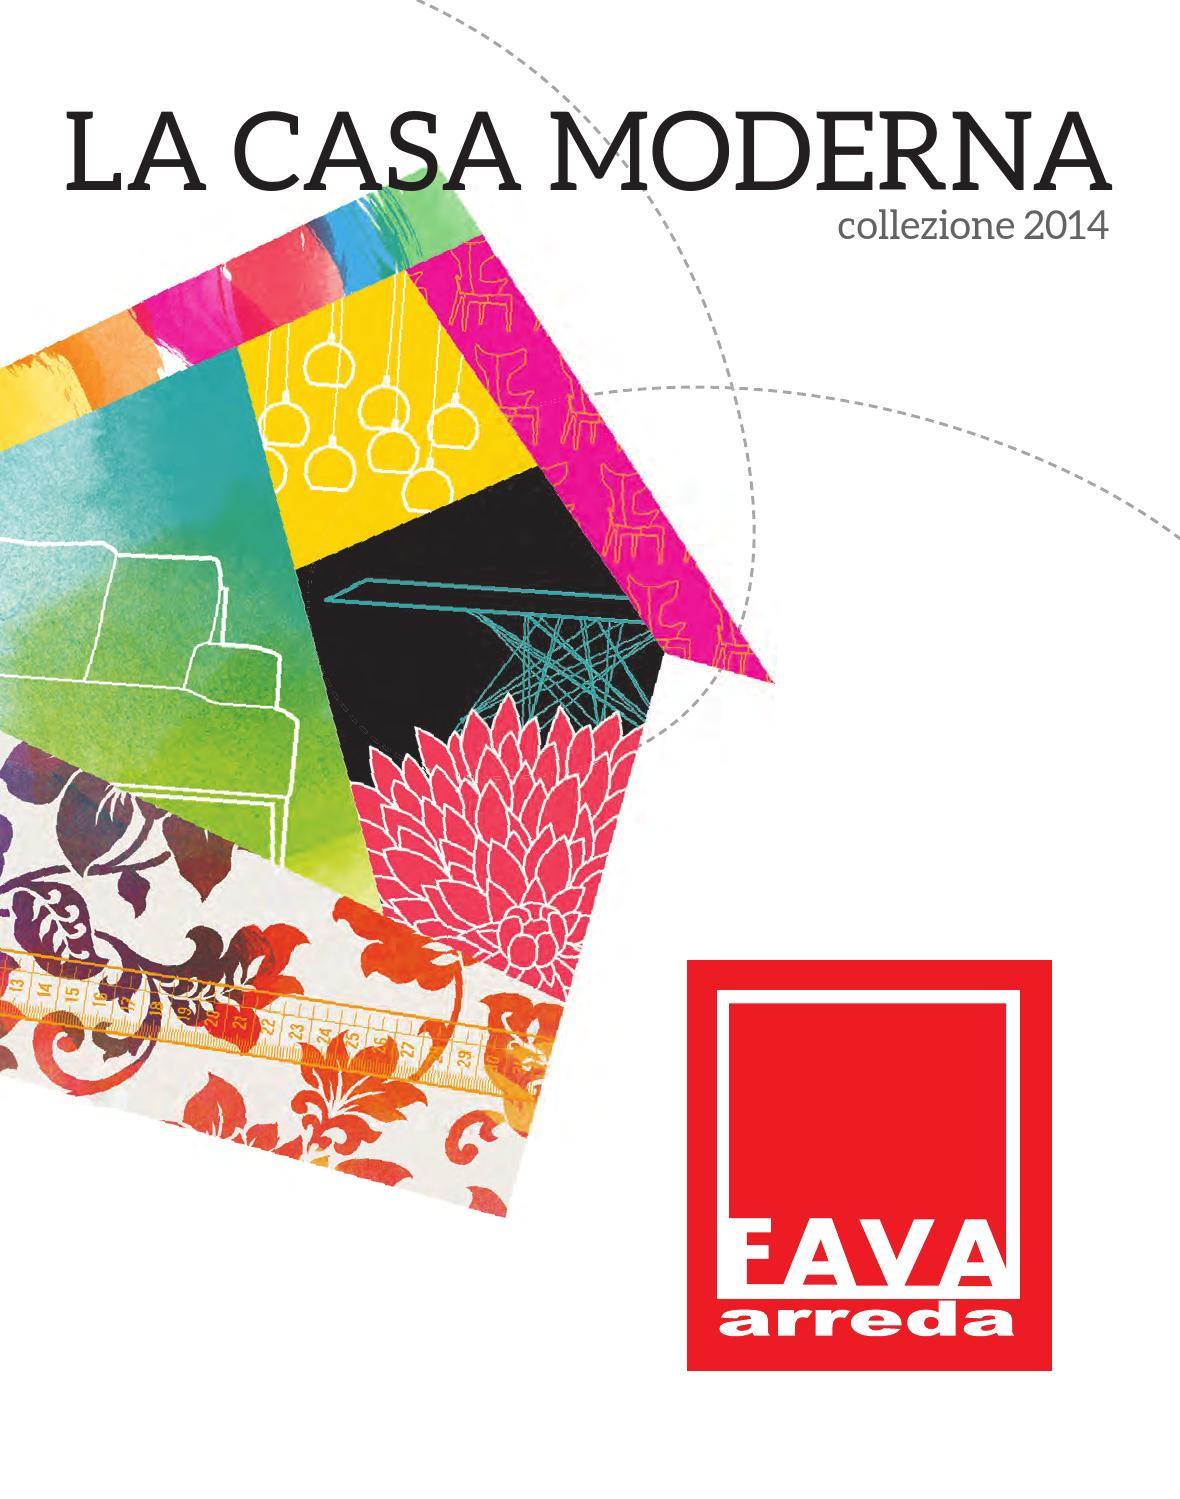 Fava arreda la casa moderna by ciociaria24 issuu for Fava arreda